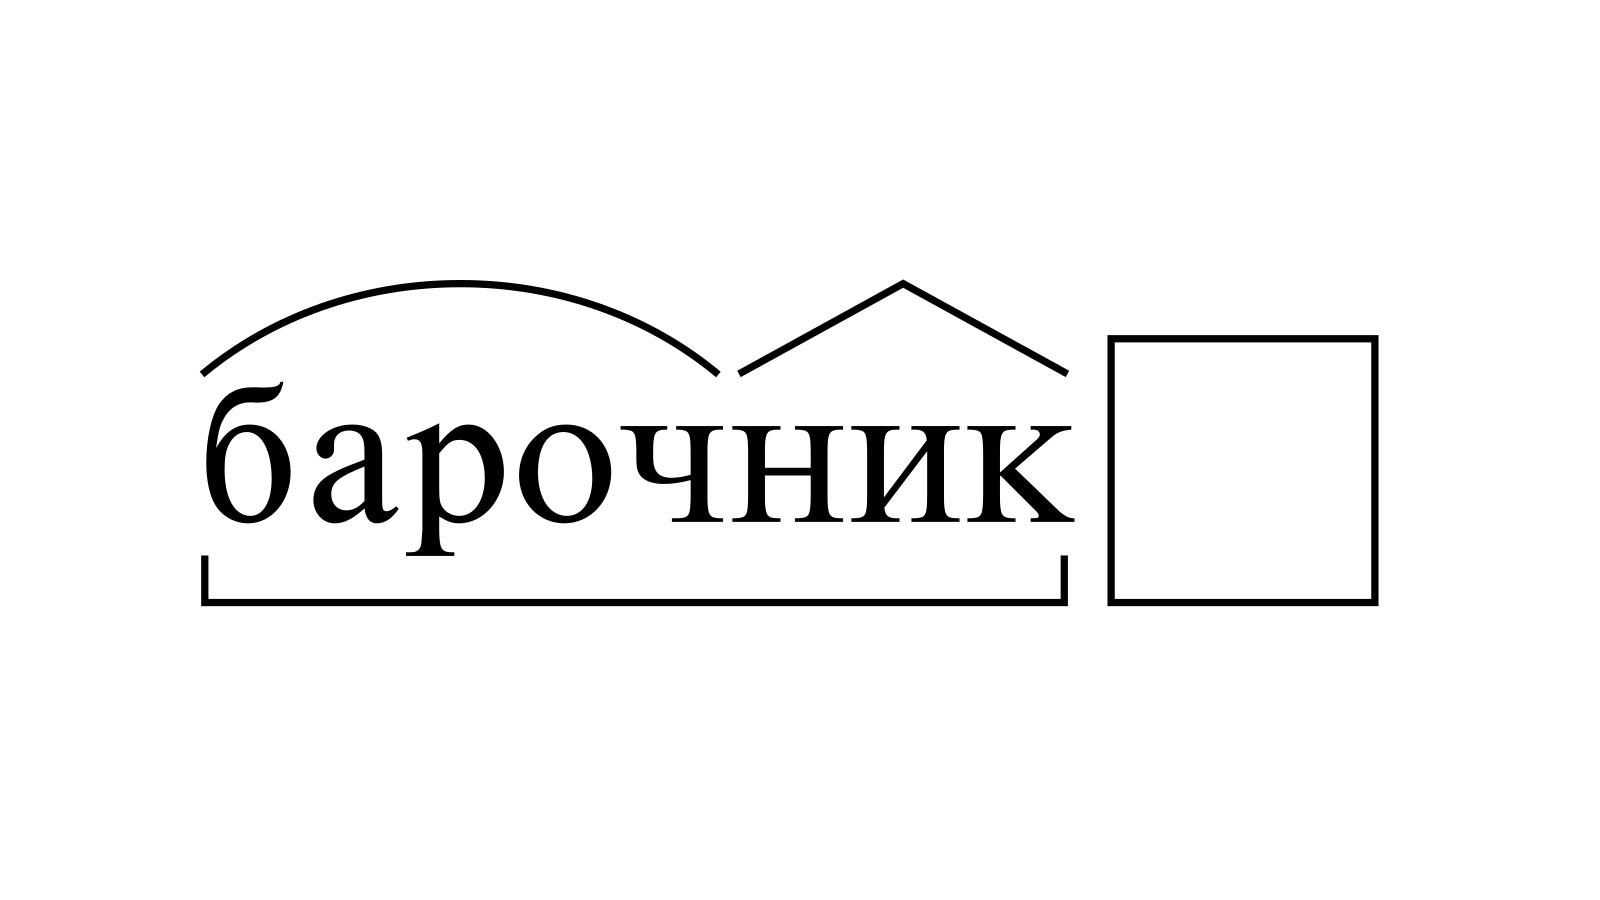 Разбор слова «барочник» по составу